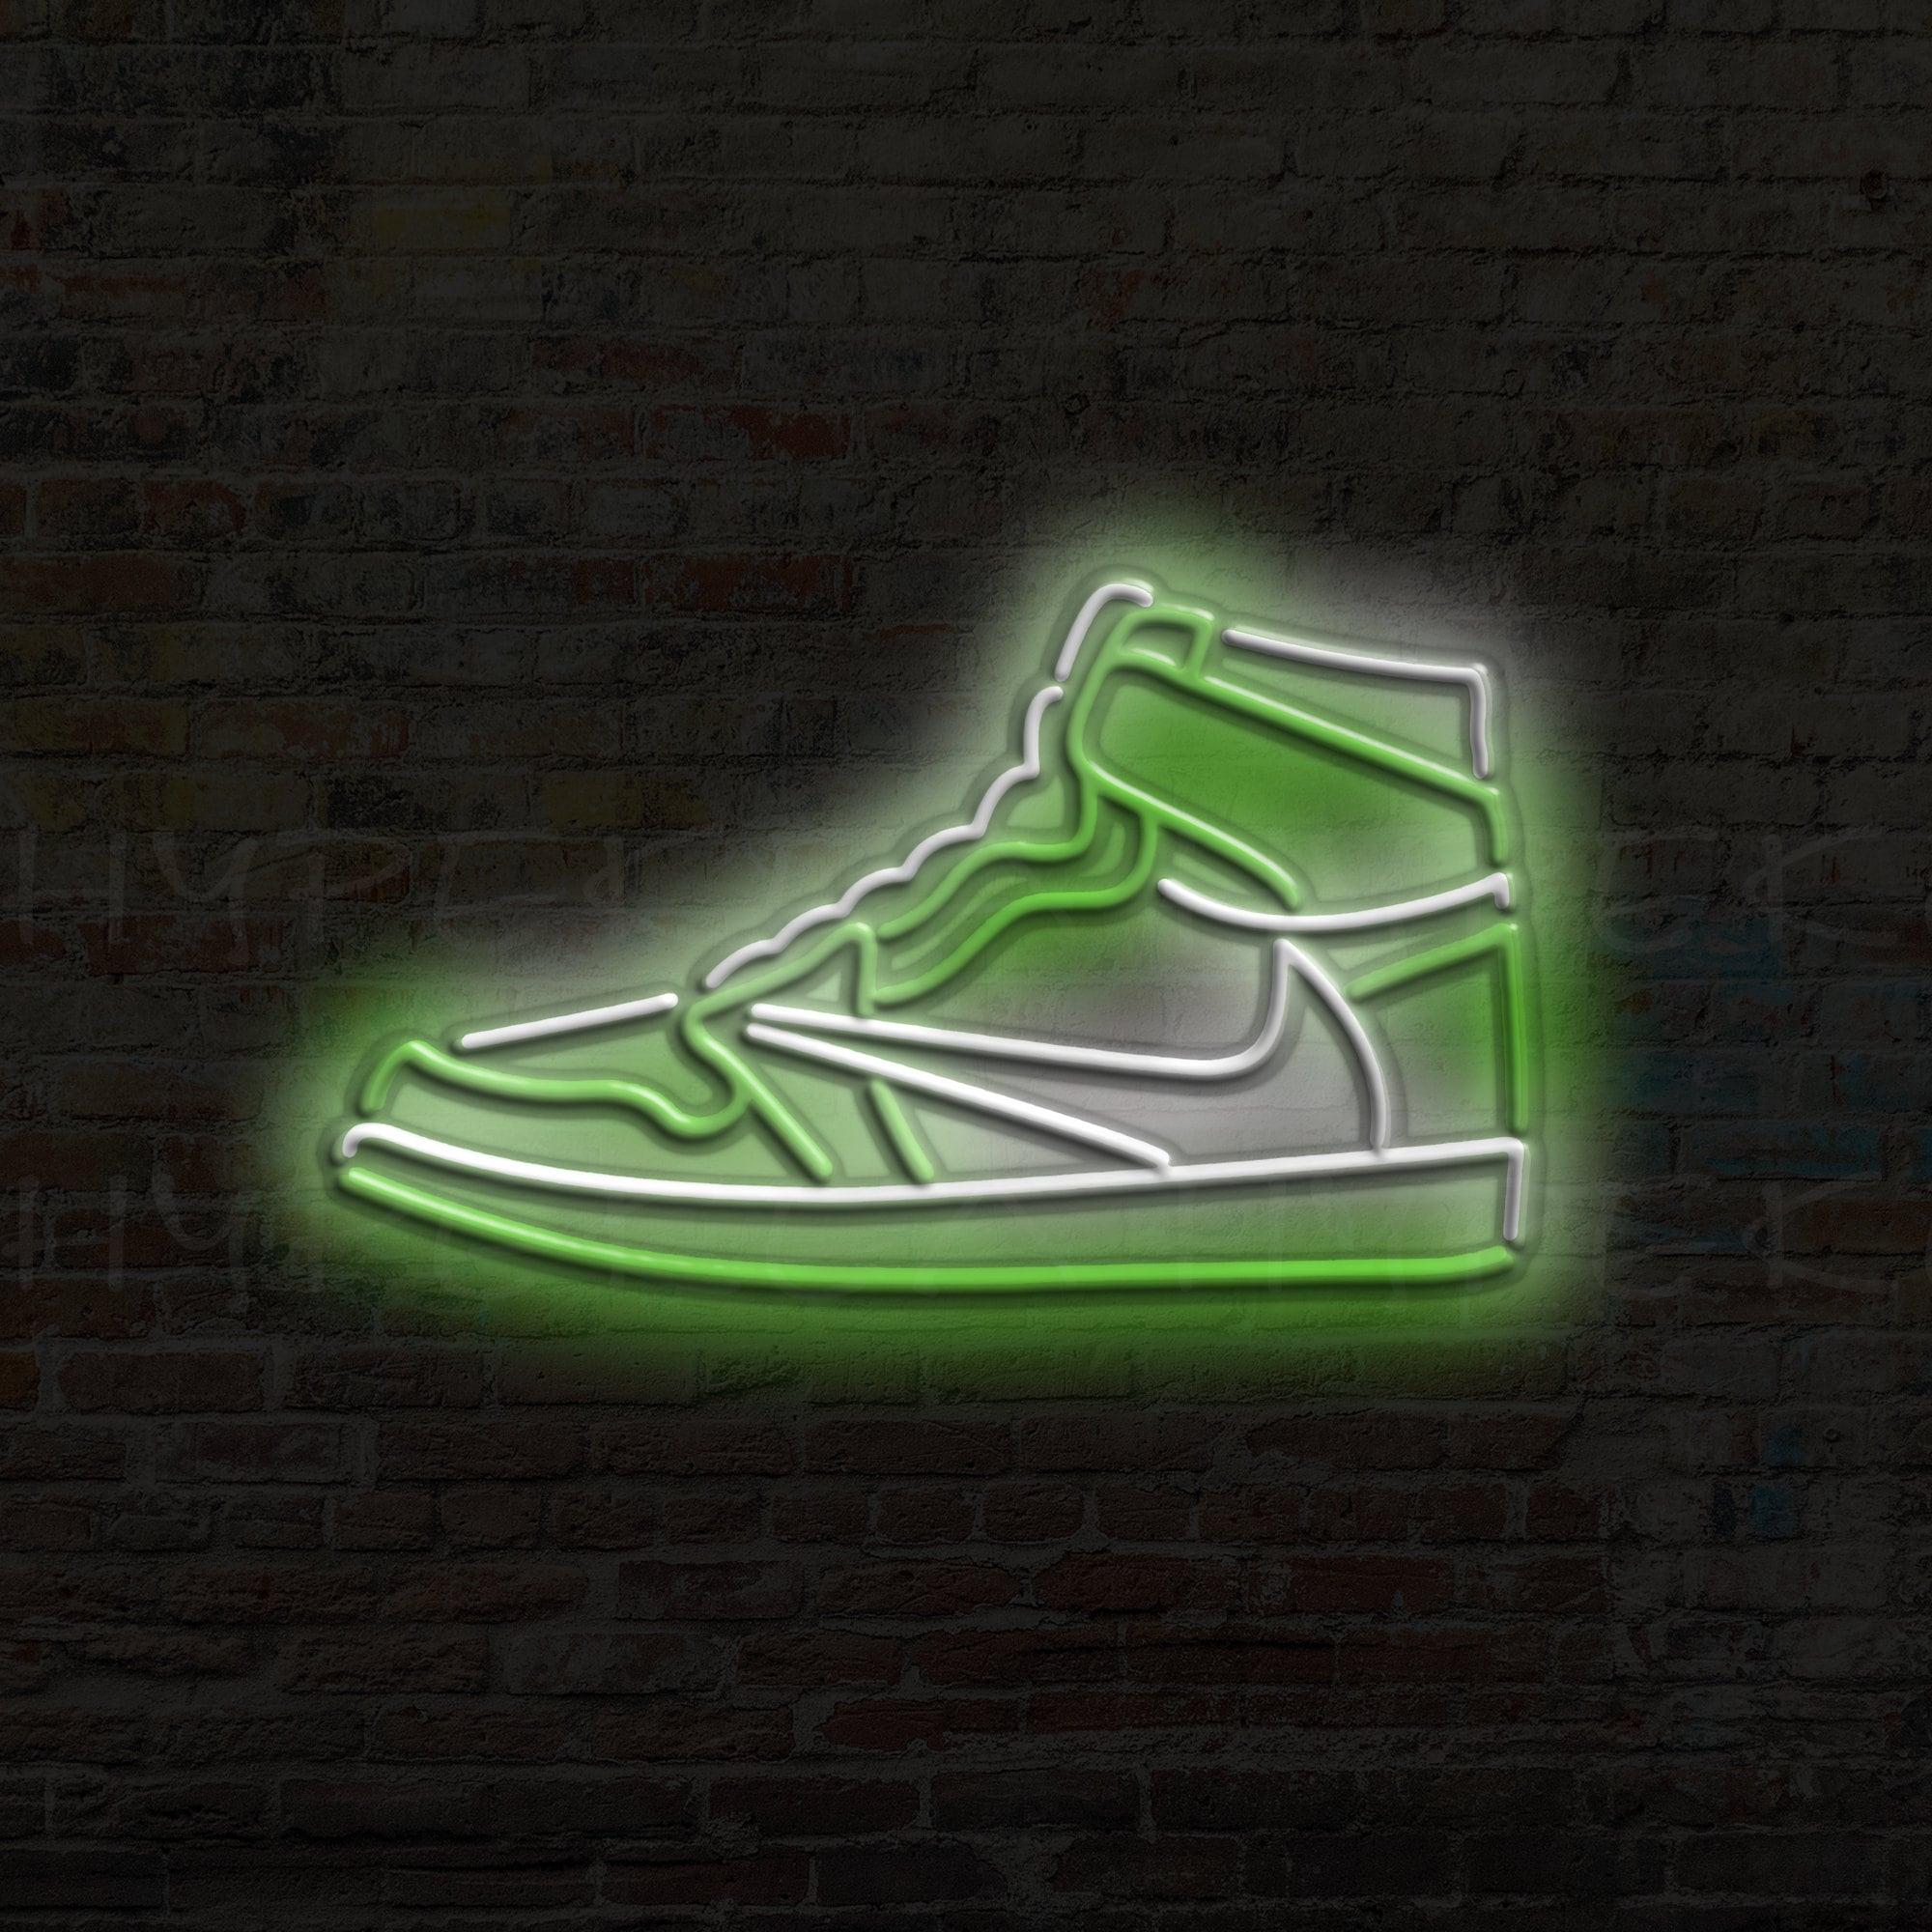 Air Jordan 1 Cactus Jack Neon Travis Scott LED sneakers shoes nike gift decoration buddy garcon custom signs art light